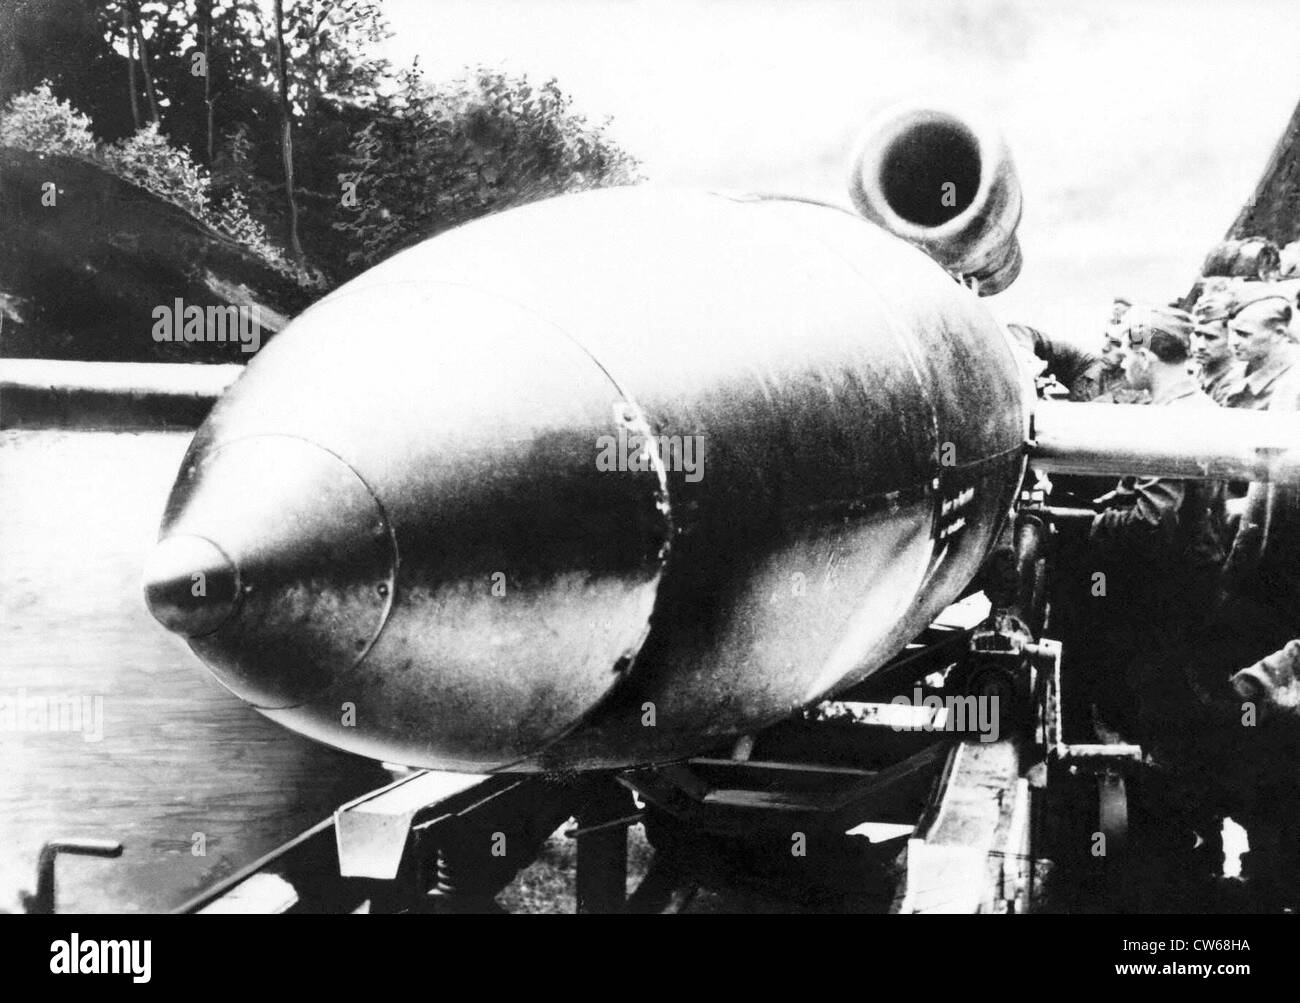 Fieseler Fi-103 (FZG-76) V-1 rocket ready for launching, 1944. - Stock Image